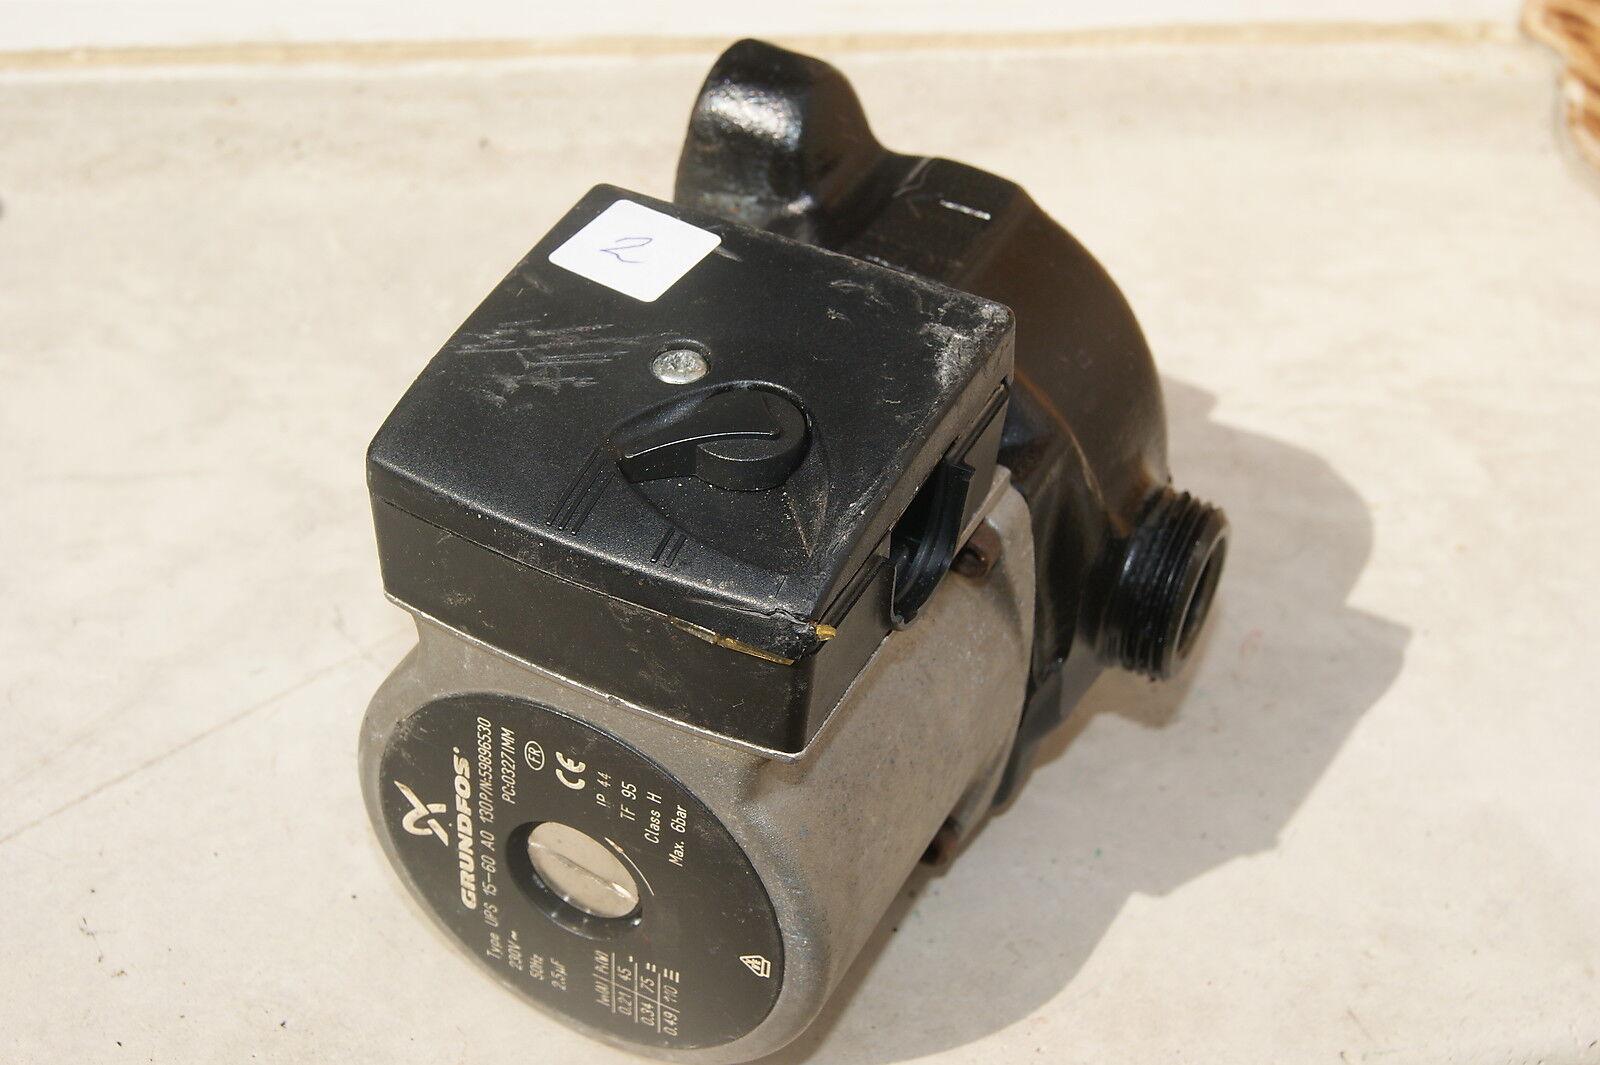 Pompe de chaudiere circulateur GRUNDFOS UPS 15-50 60 AO Occasion garantie (2)